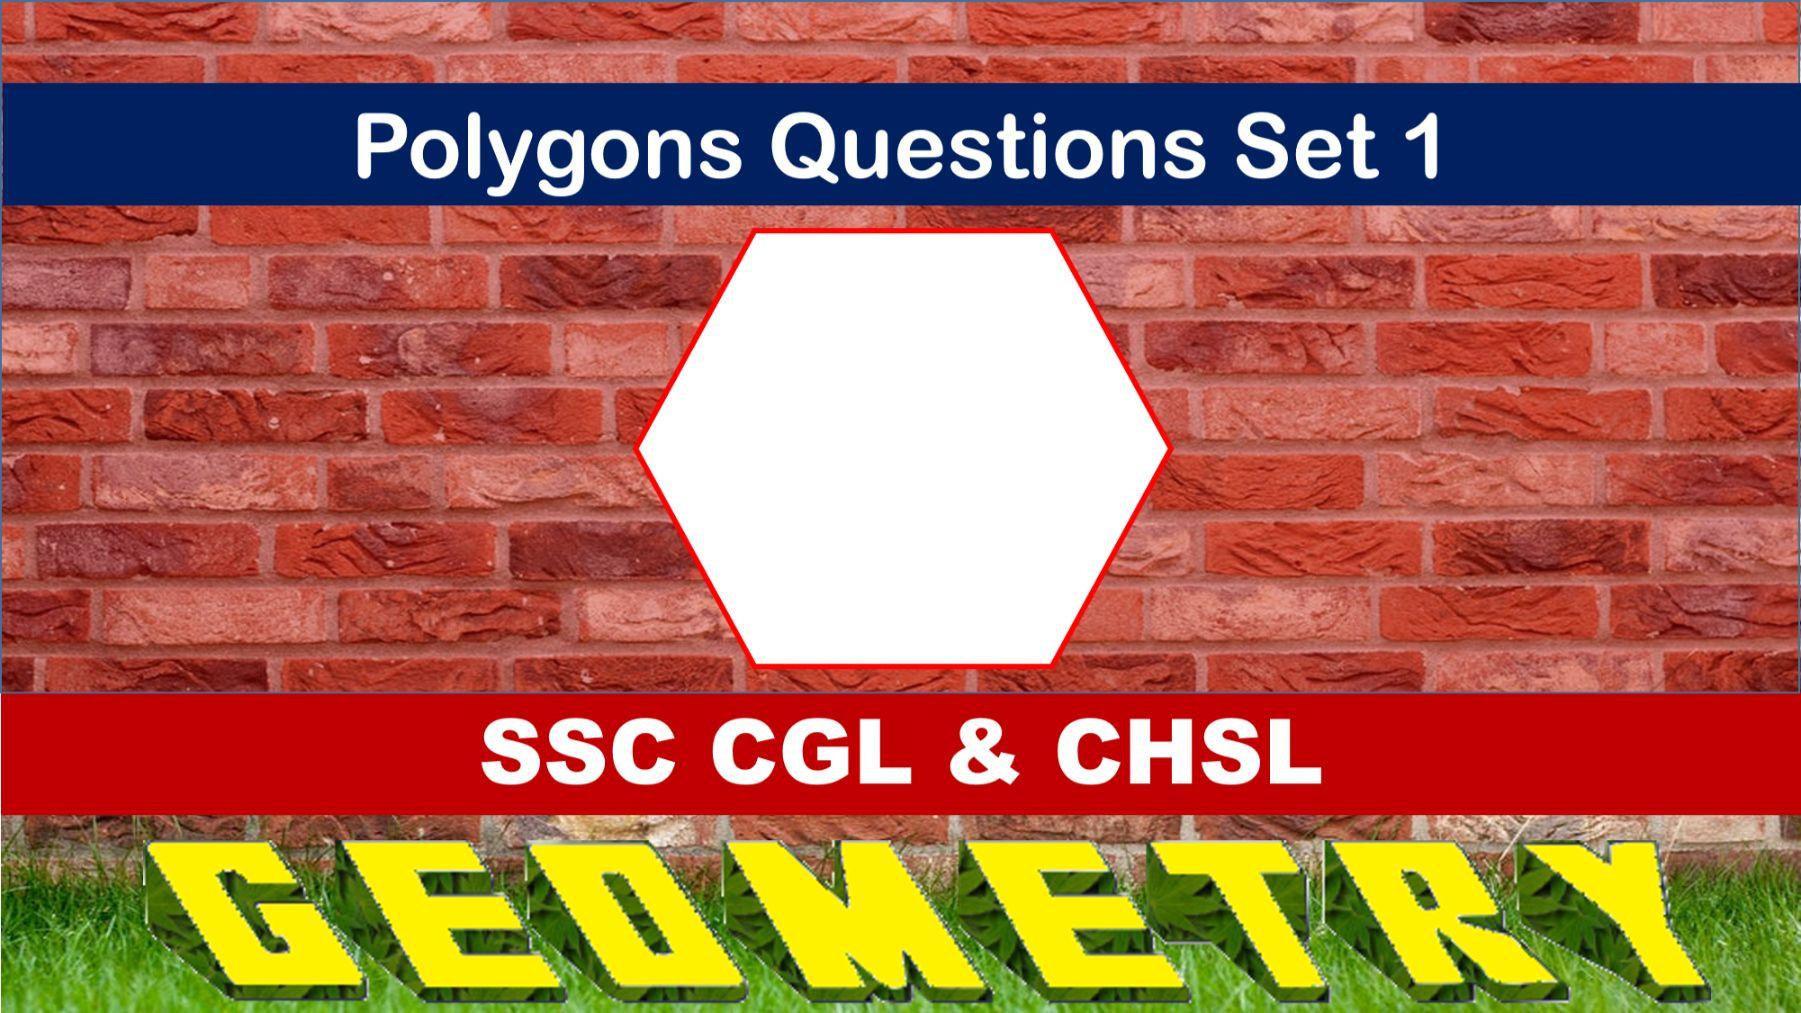 SSC CGL Geometry Polygons Set 1